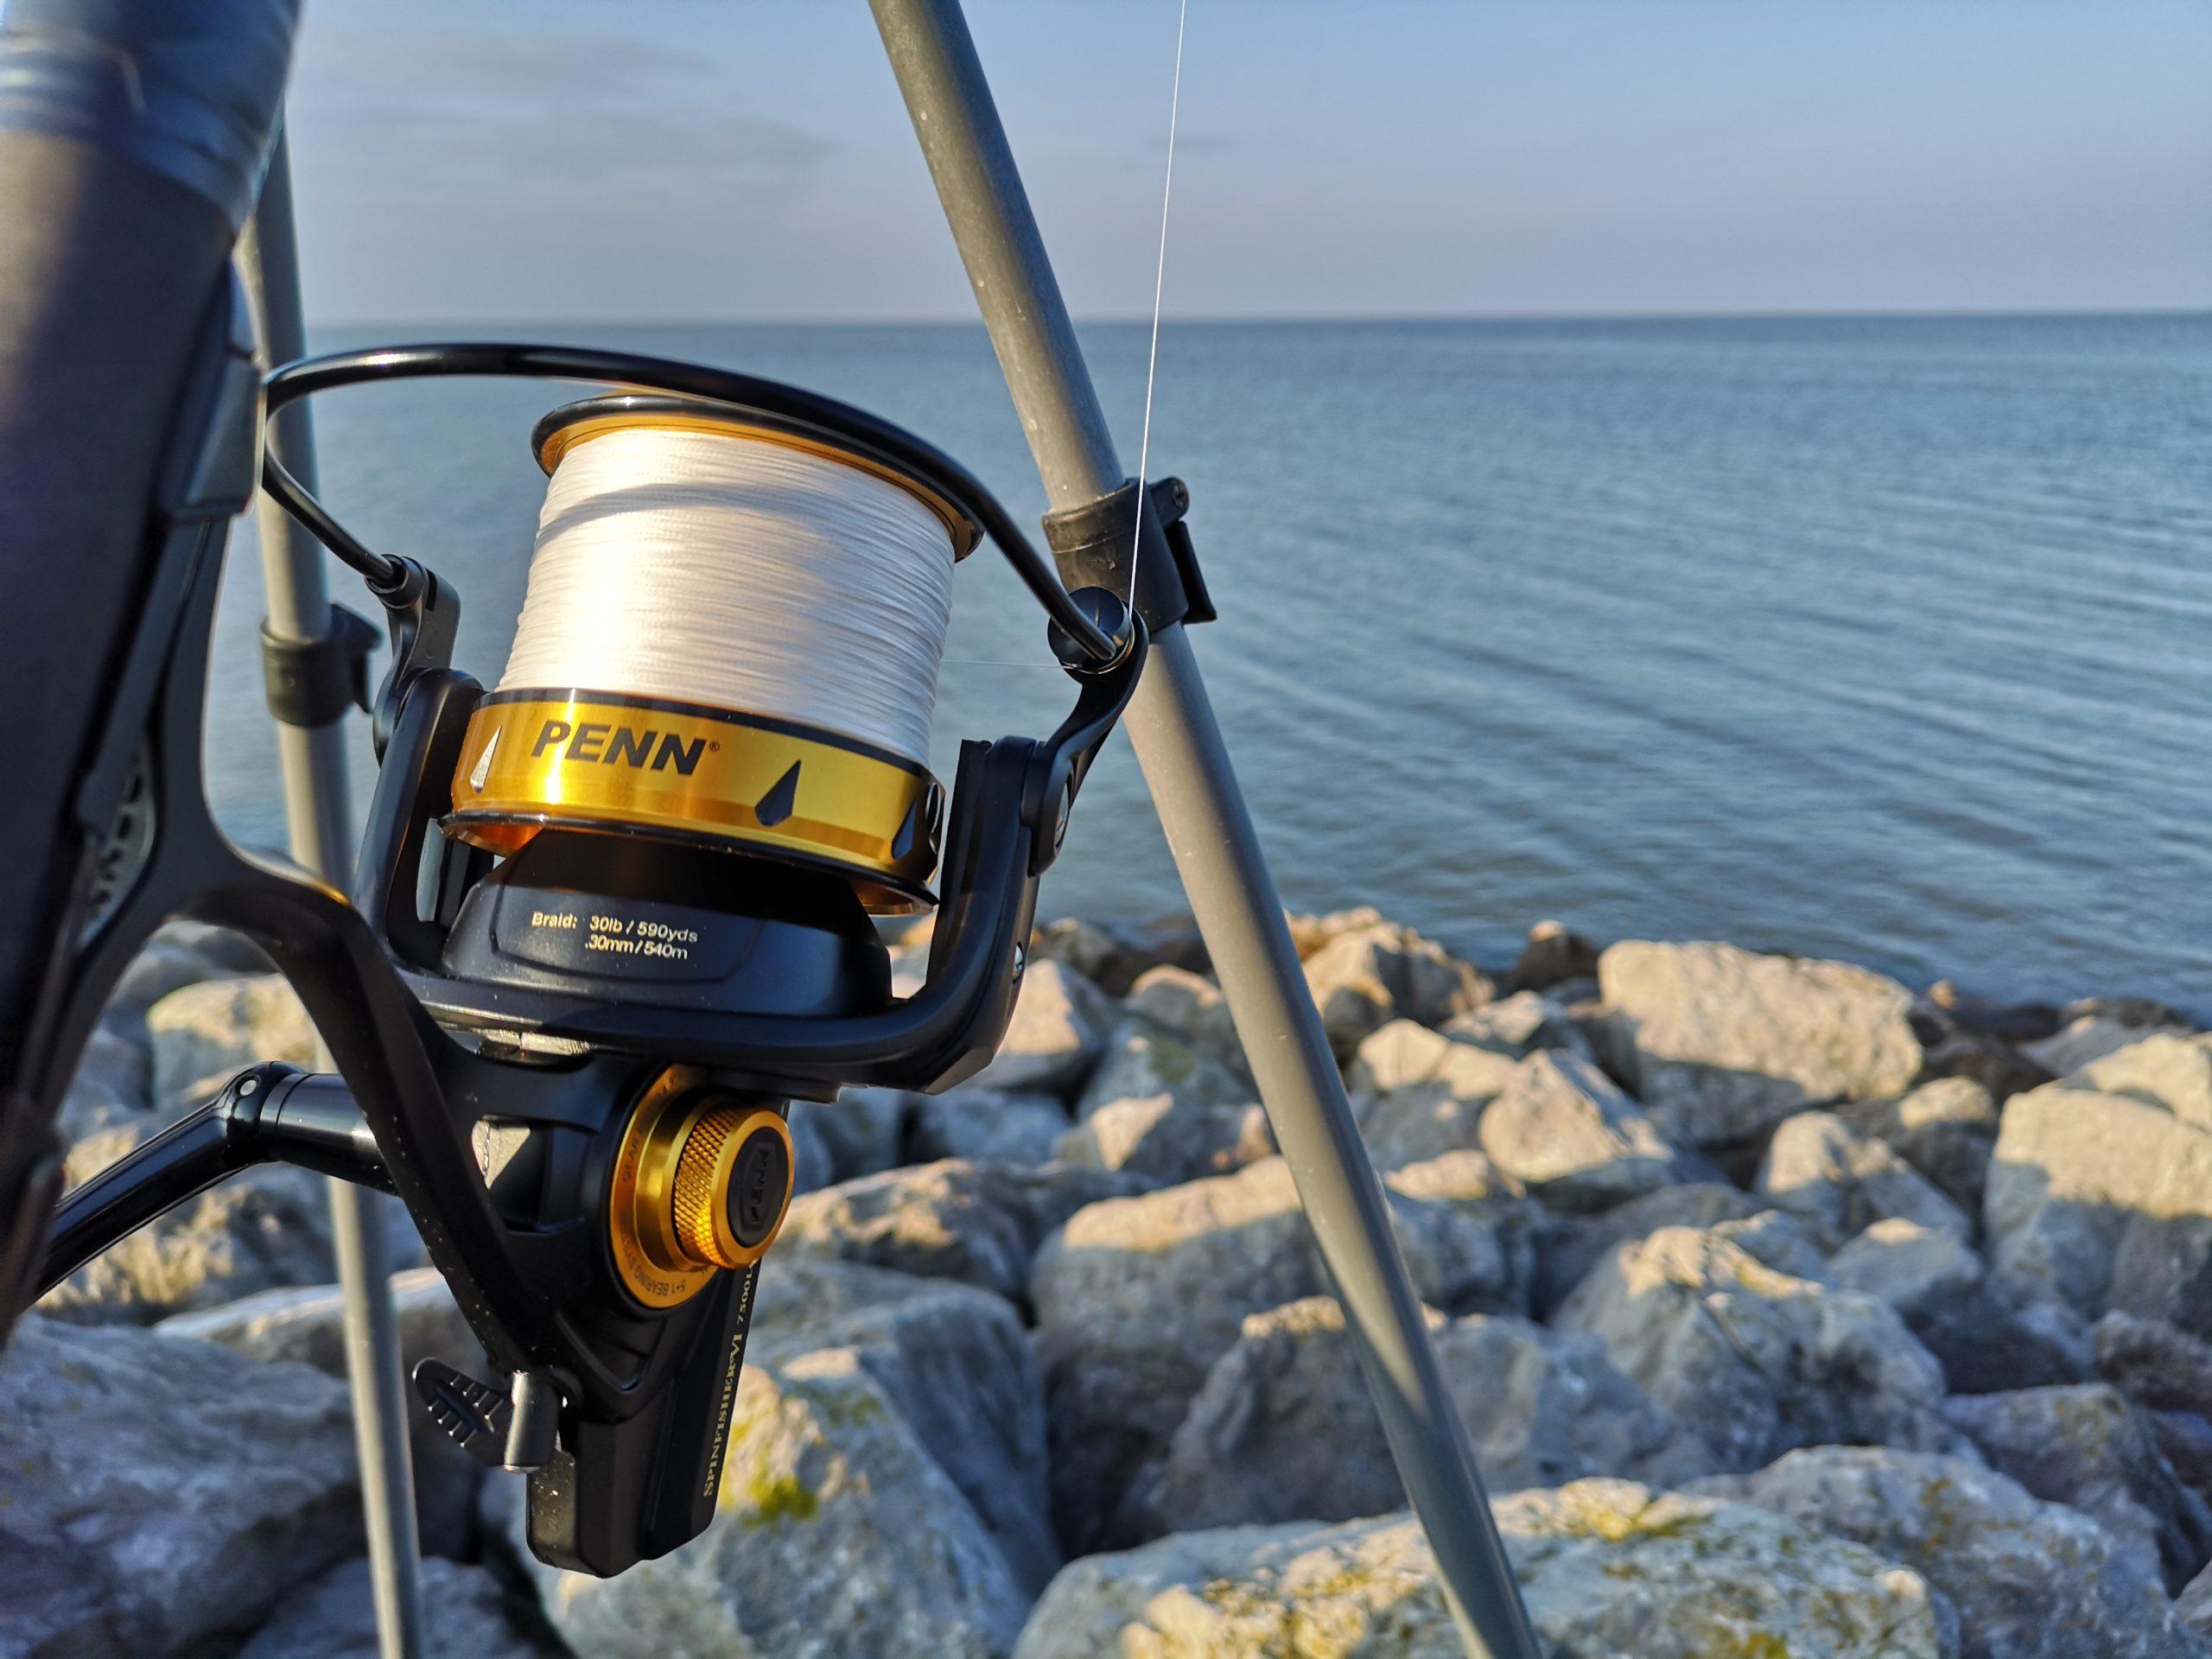 Daiwa Crossfire LT Spinning Reels Fixed Spool Sea Fishing Reel *